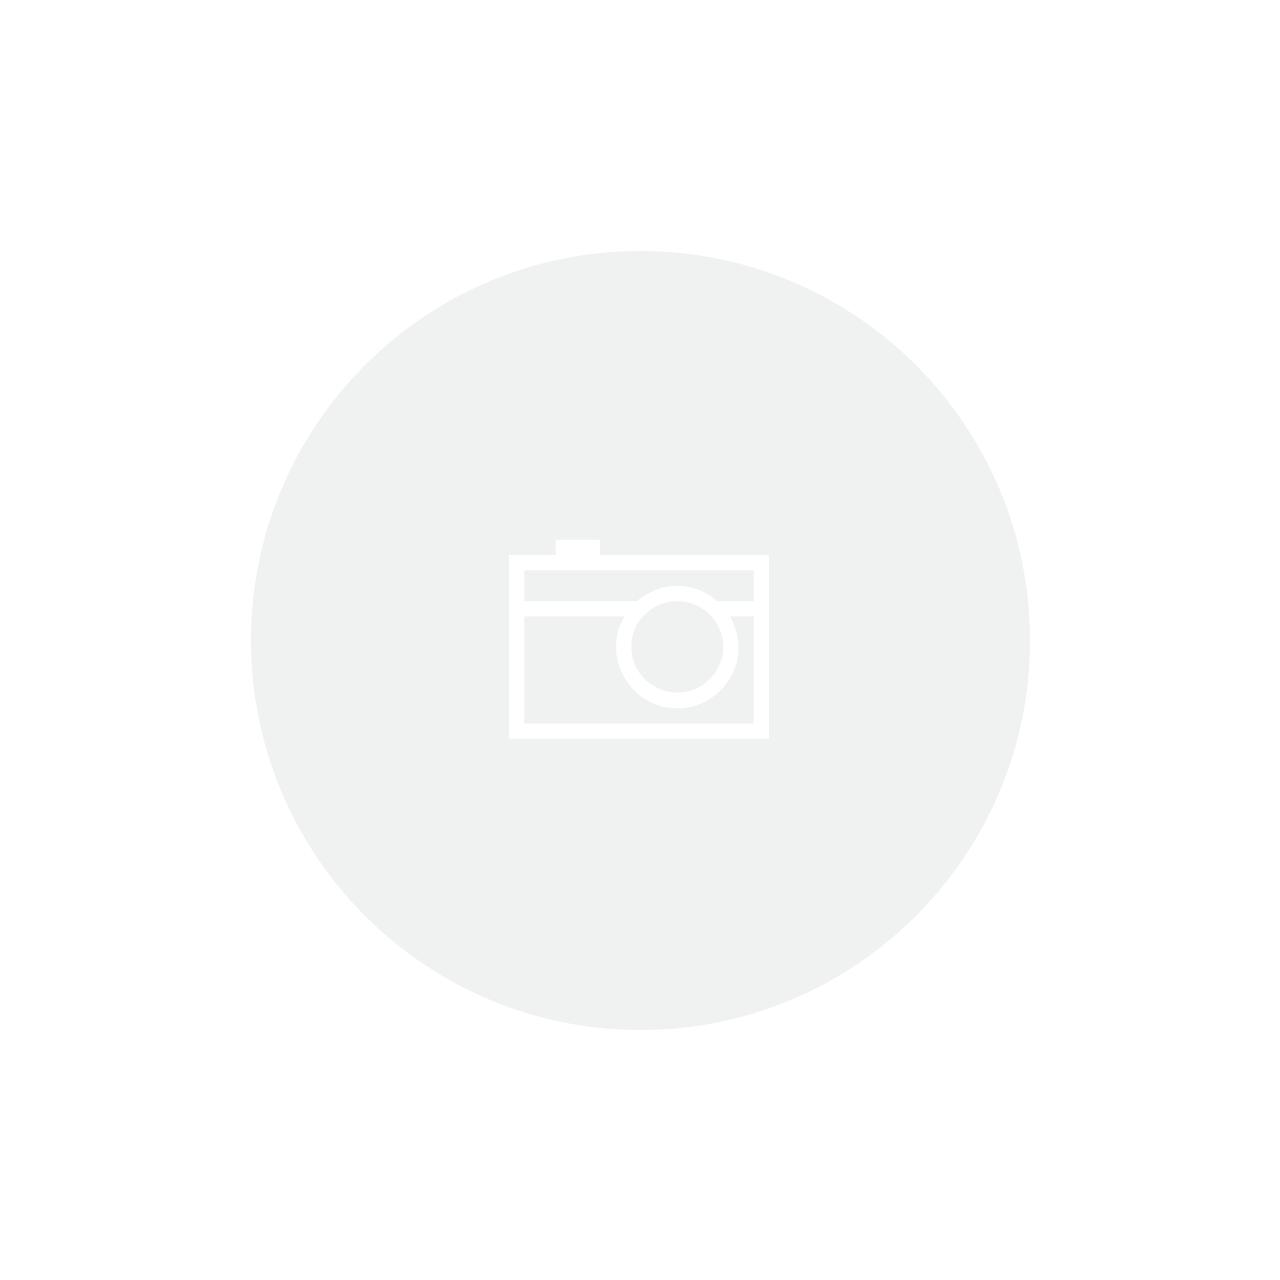 Papel Artesanal Indiano - Ref. 100